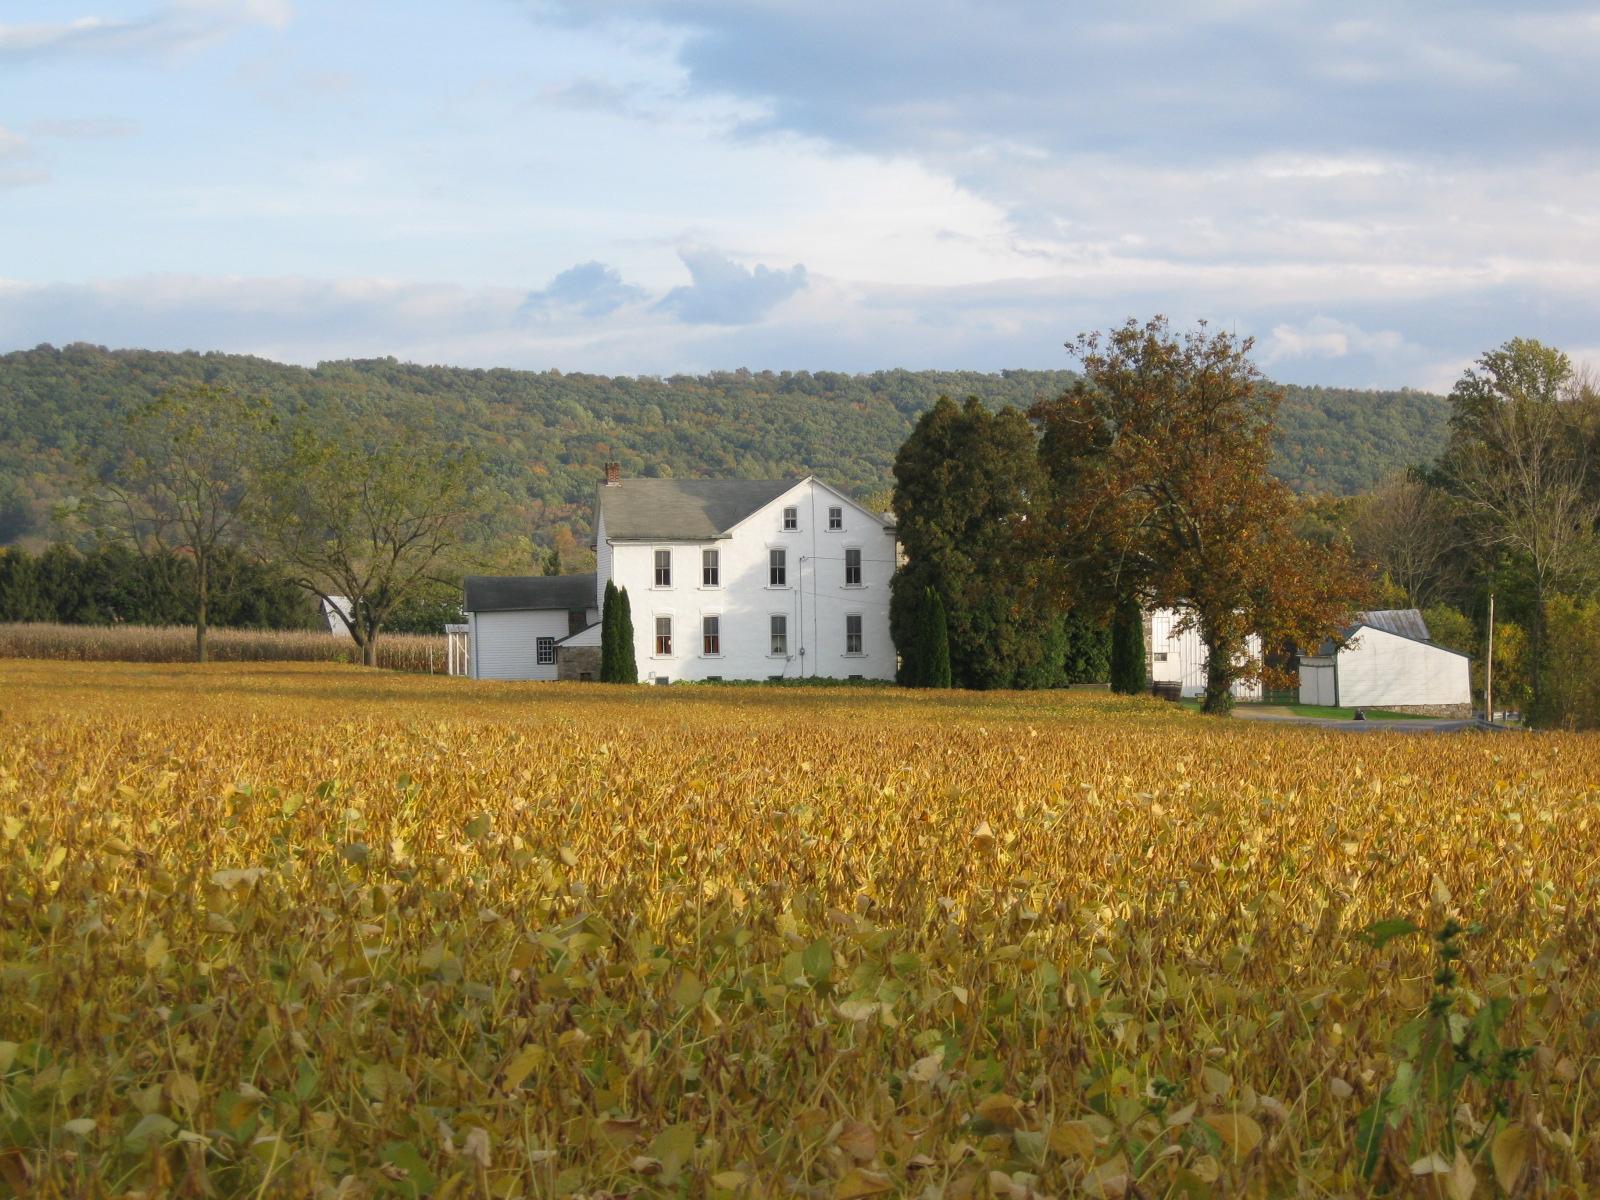 Moravians: Oley, Pennsylvania -